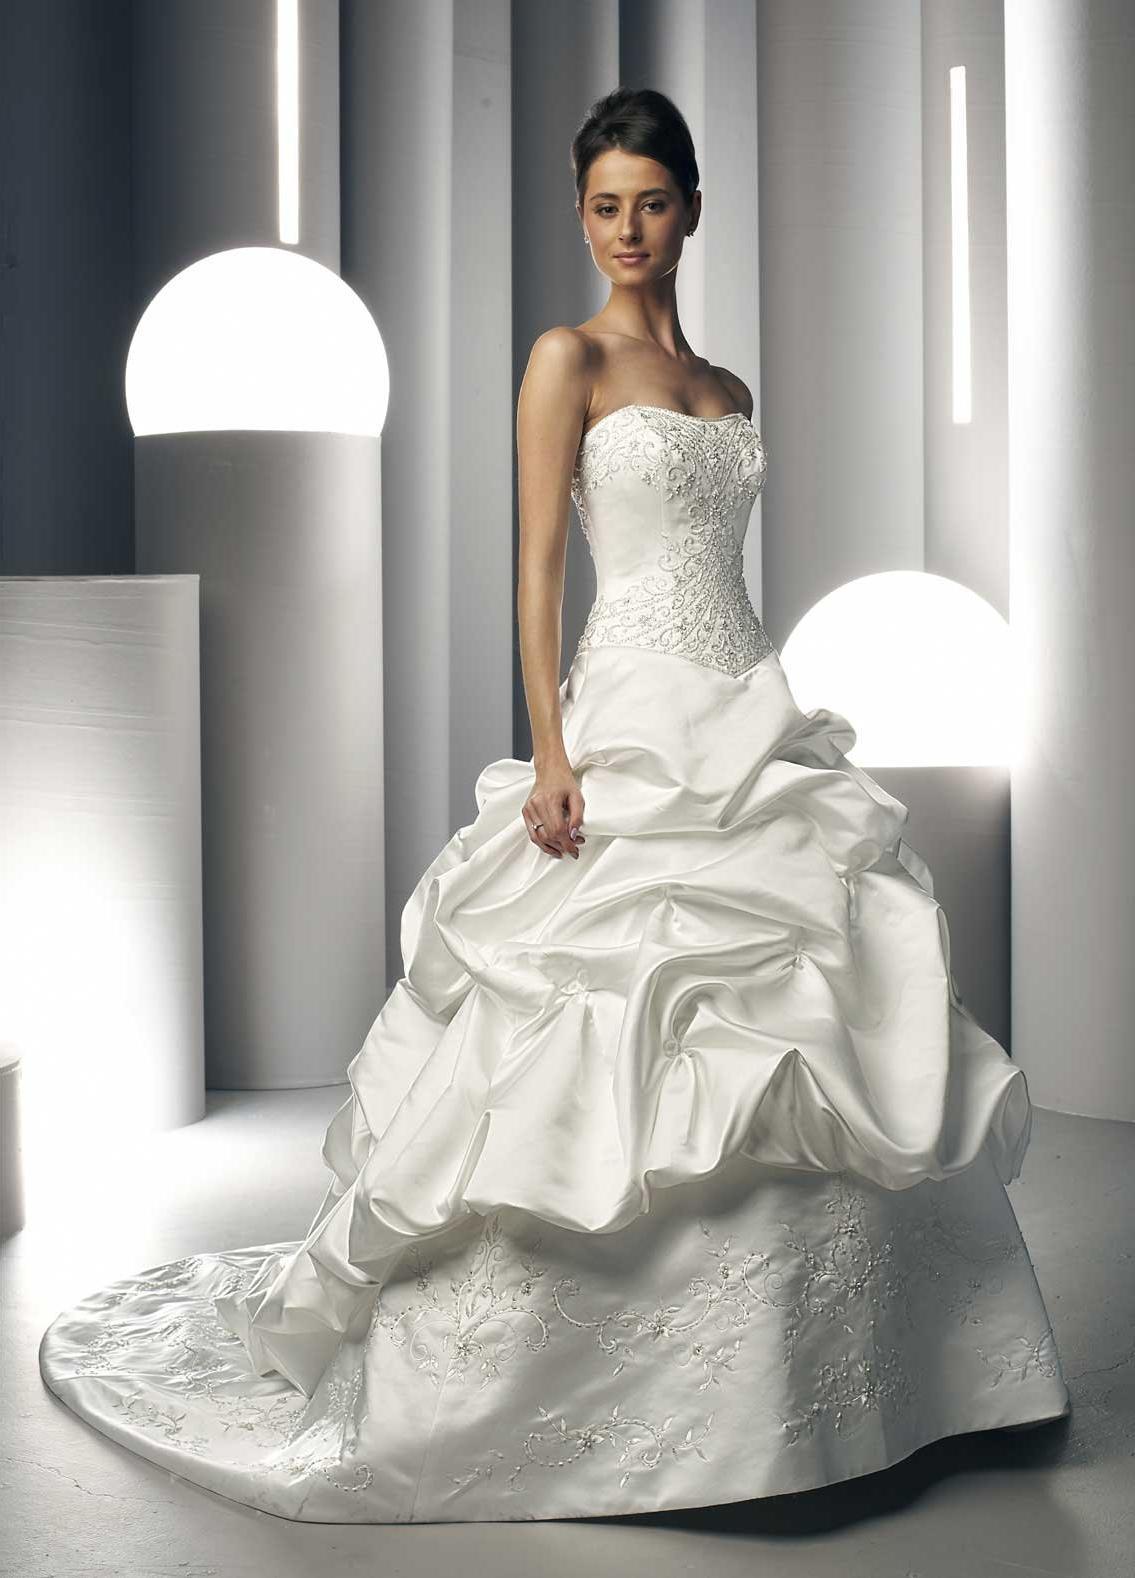 curly wedding dress